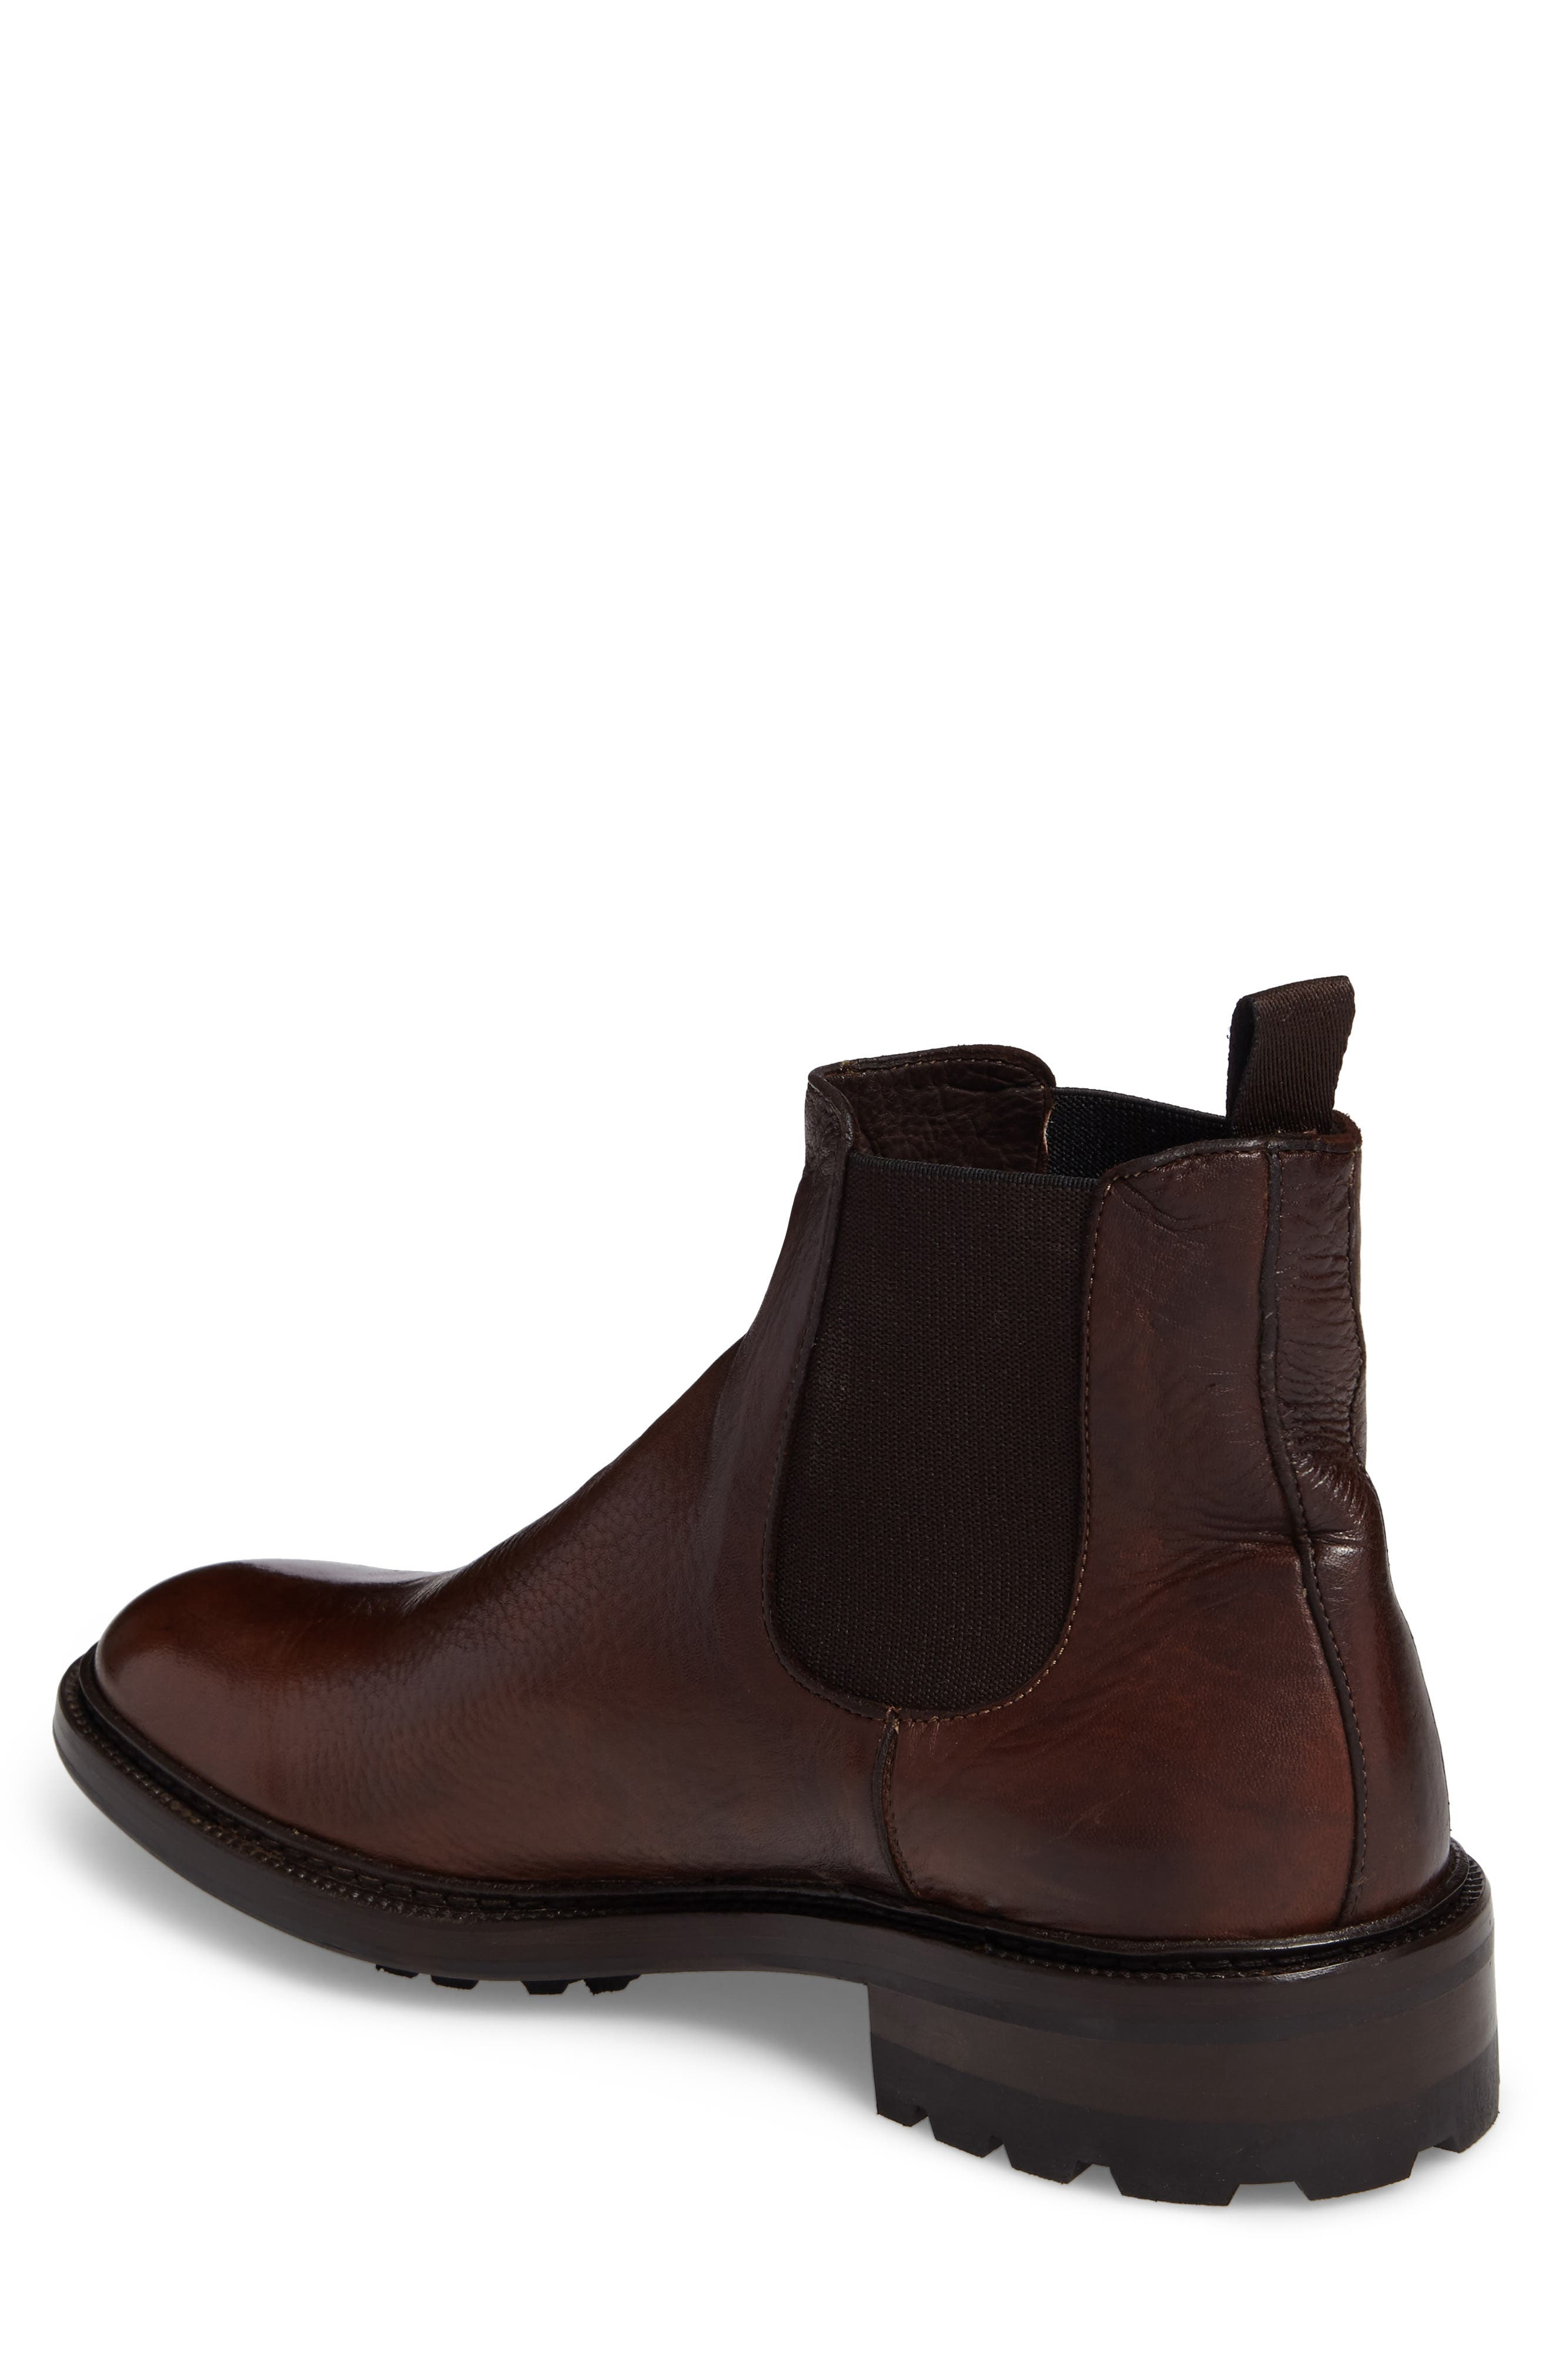 Shoe Bottes The Friday Chelsea S Fe Bear doCBerxW